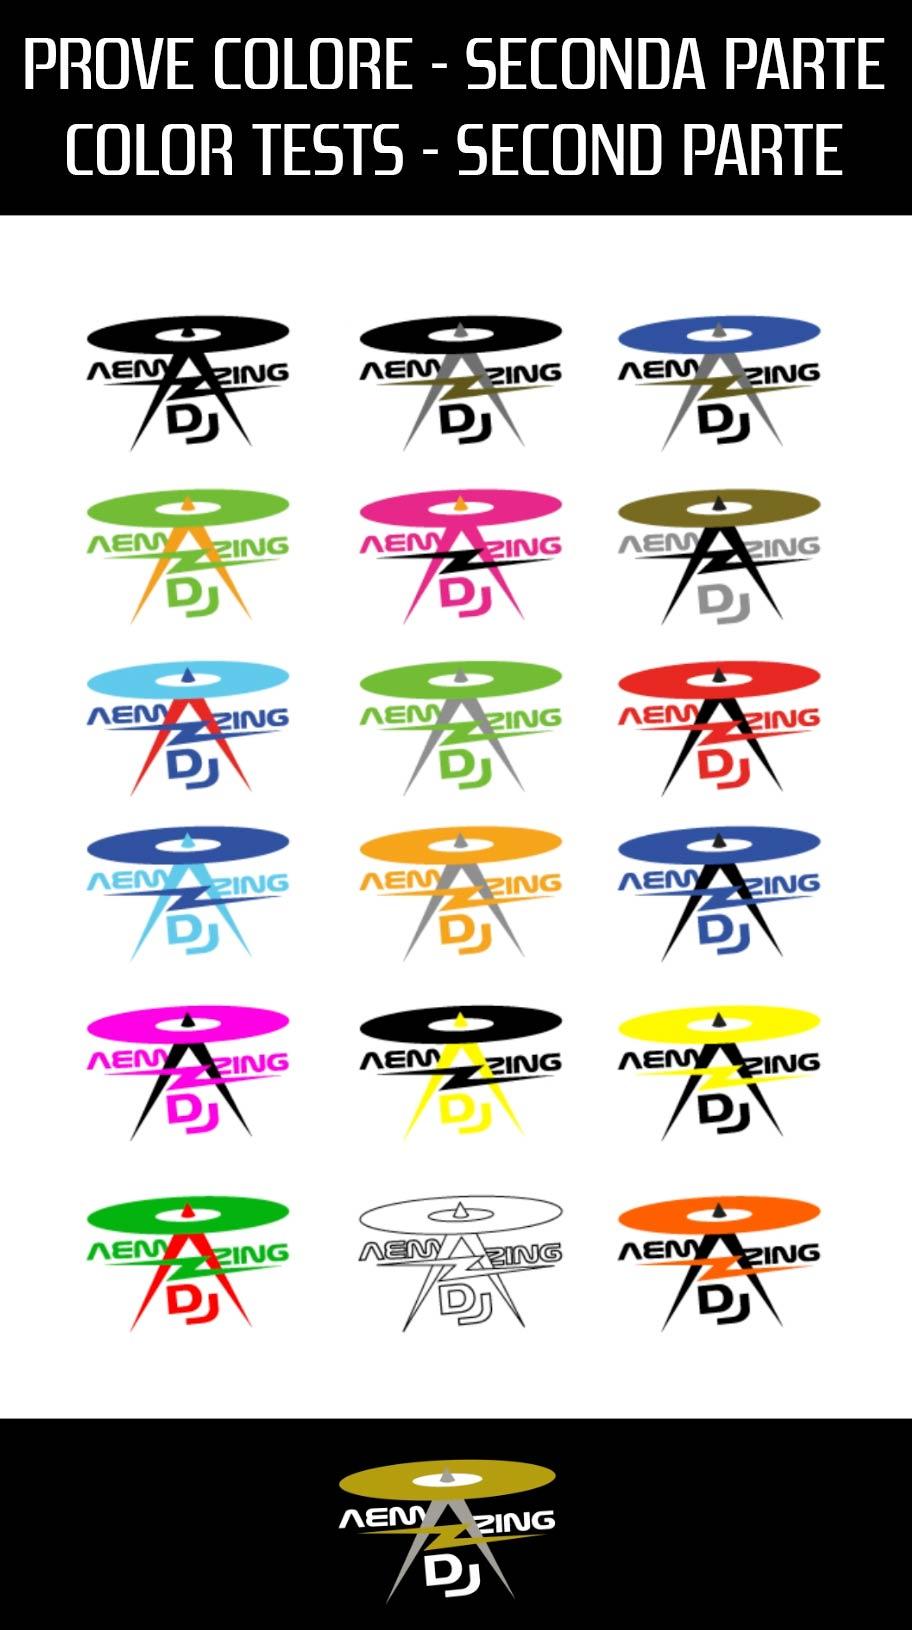 varie prove colore del logo AEMazing DJ